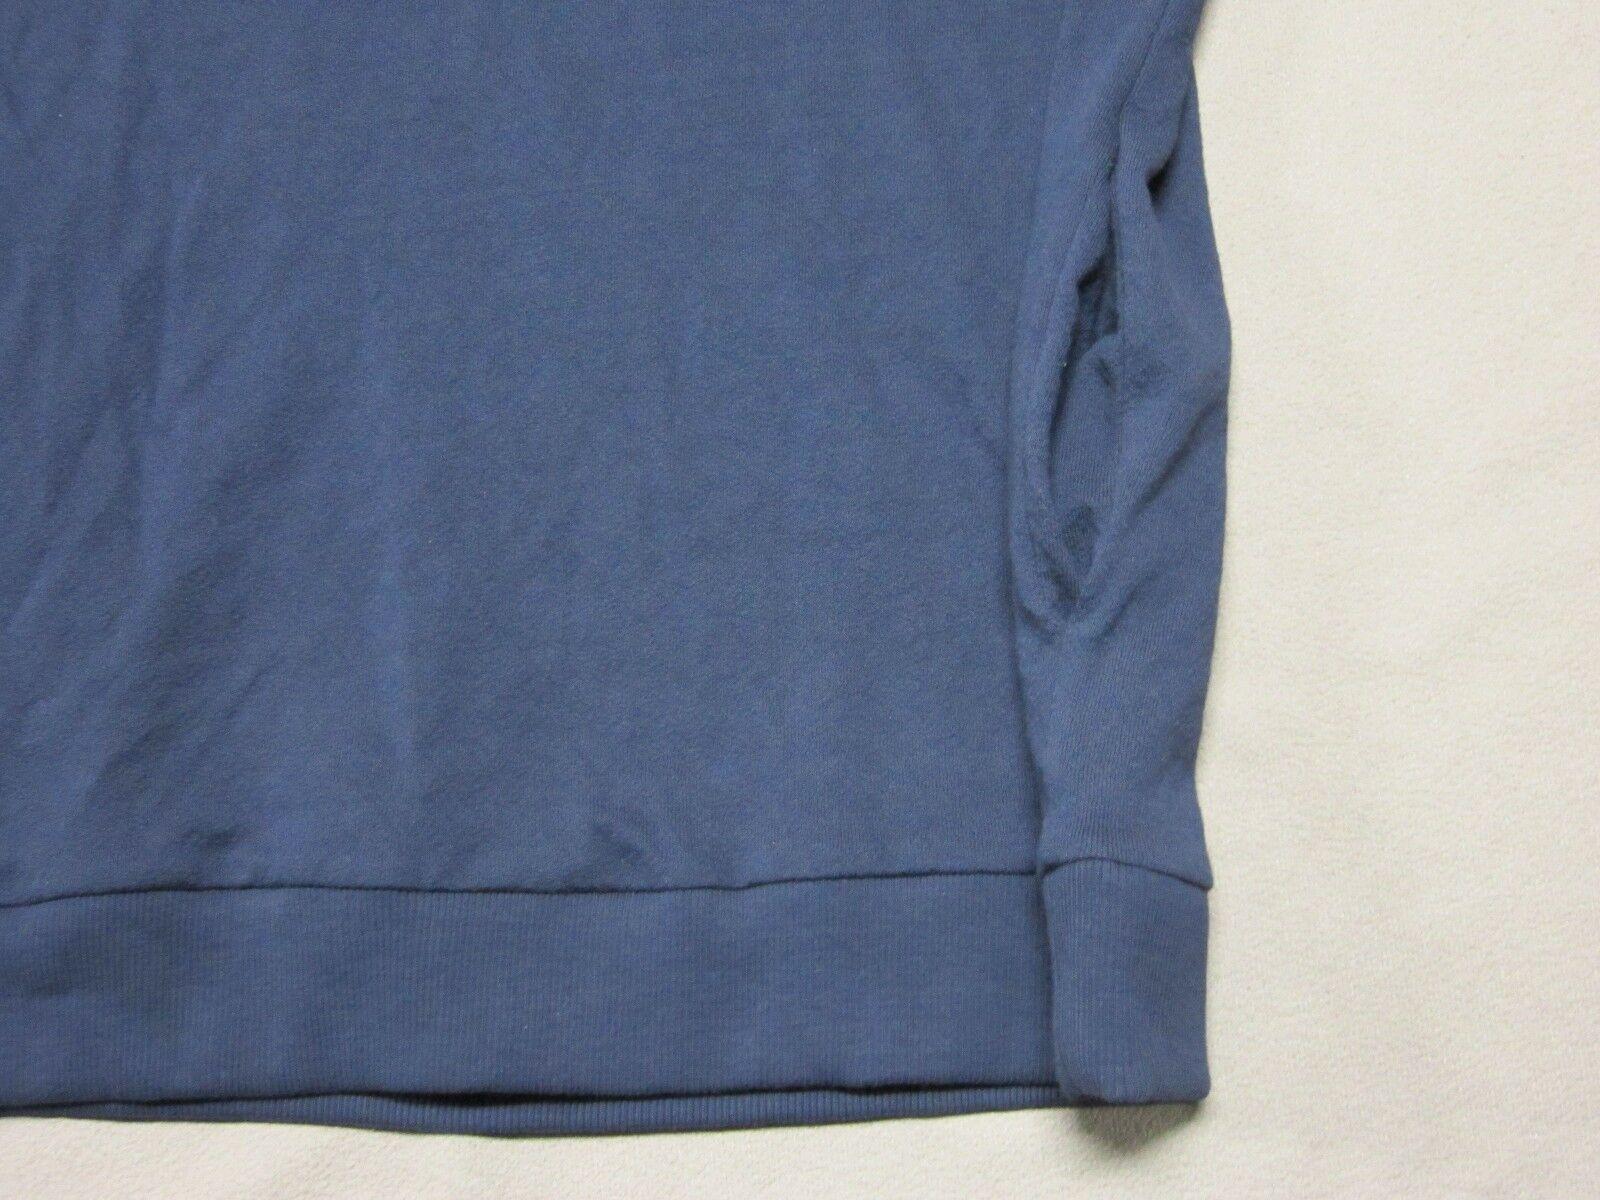 ALTERNATIVE APPAREL WOMENS blueE ELONGATED SWEATER SWEATSHIRT DRESS SIZE SIZE SIZE MEDIUM 603515